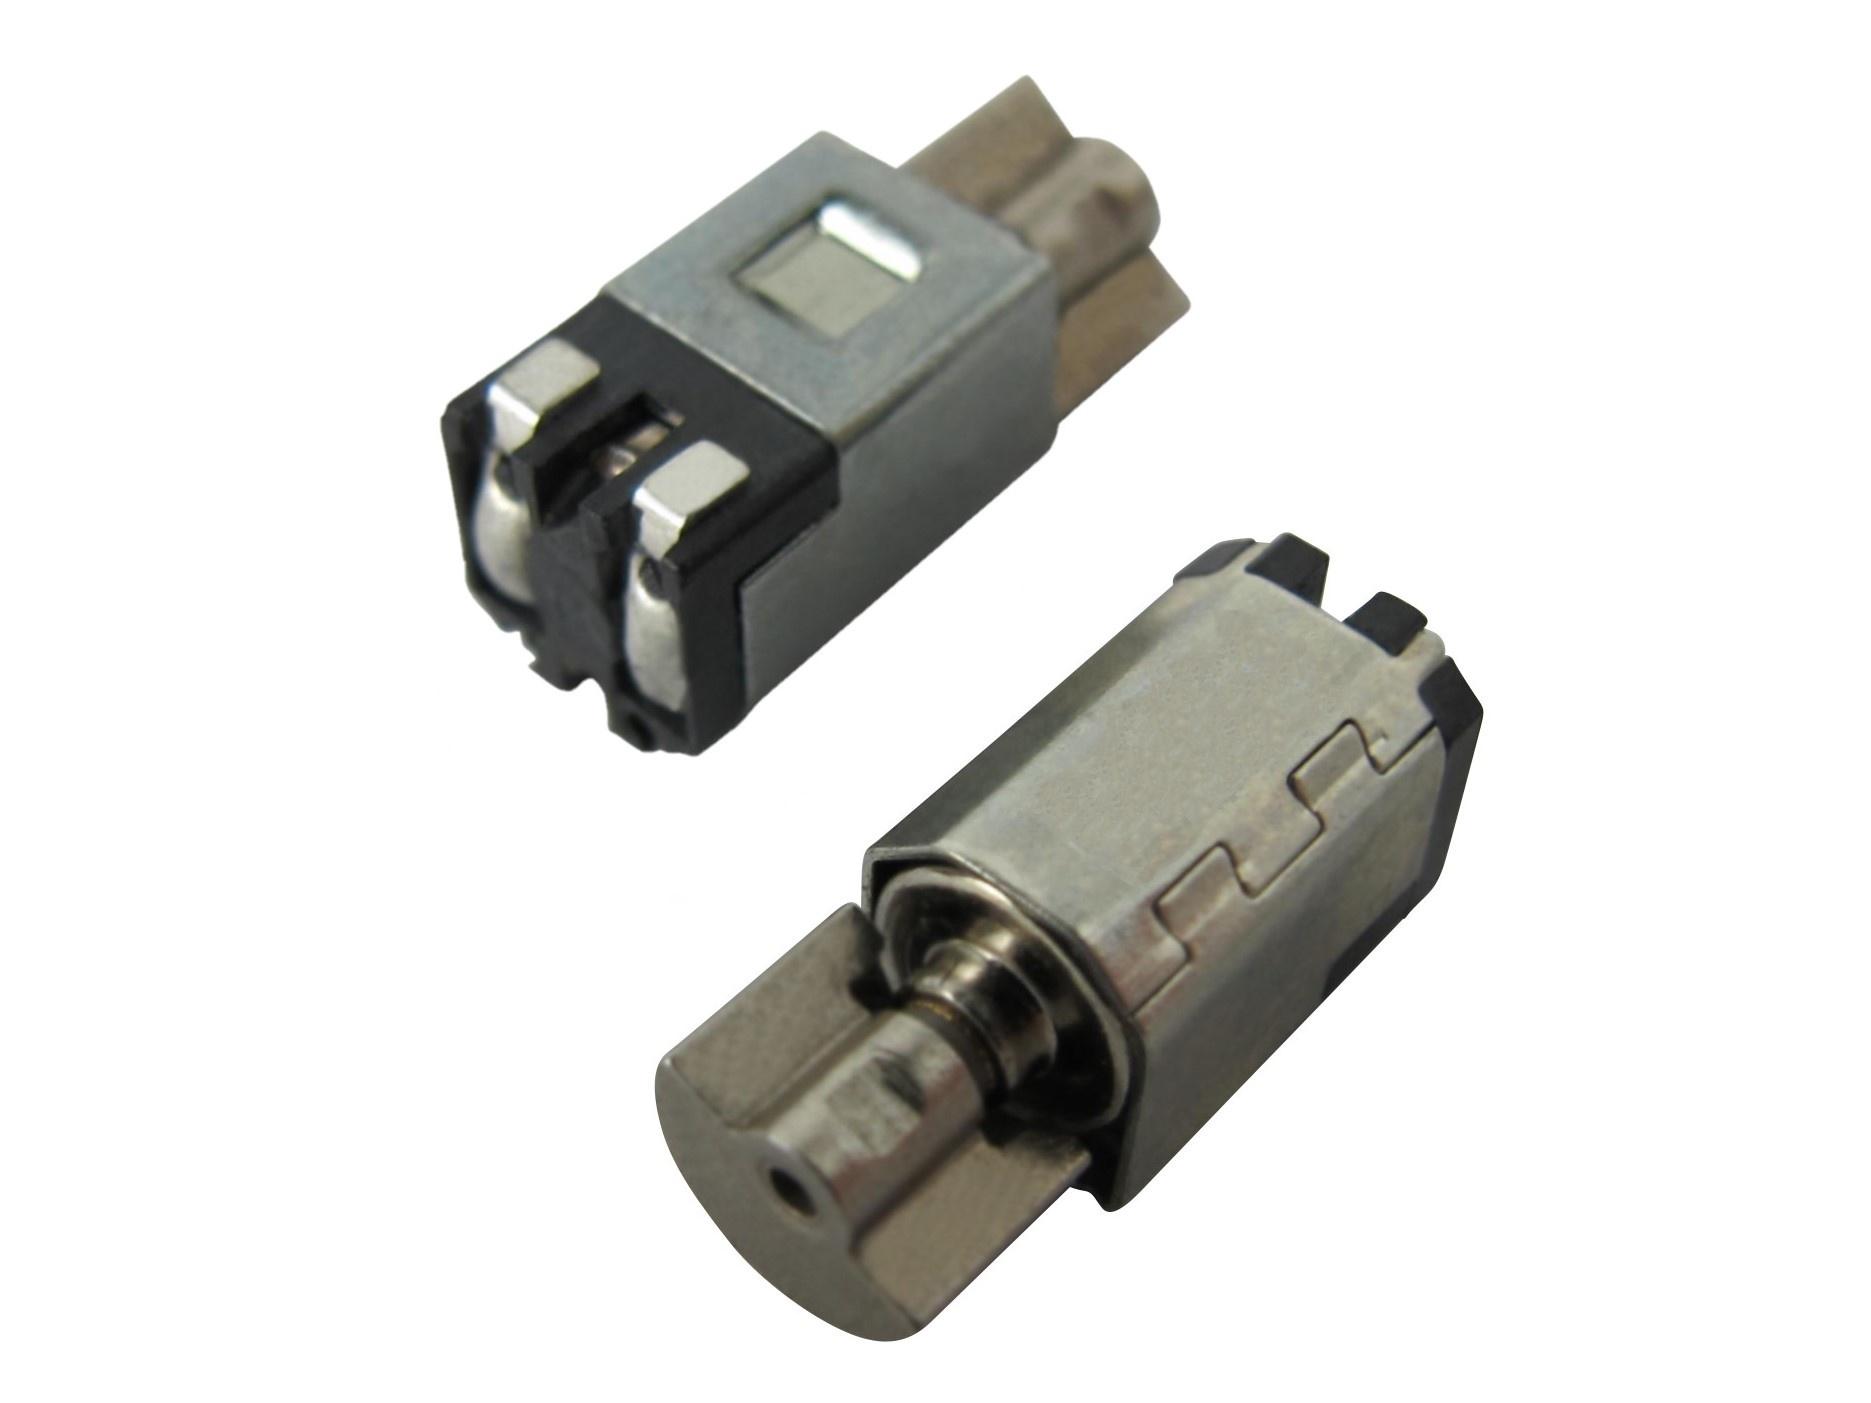 Z4FC1B1301781 Cylindrical Vibrator Motor